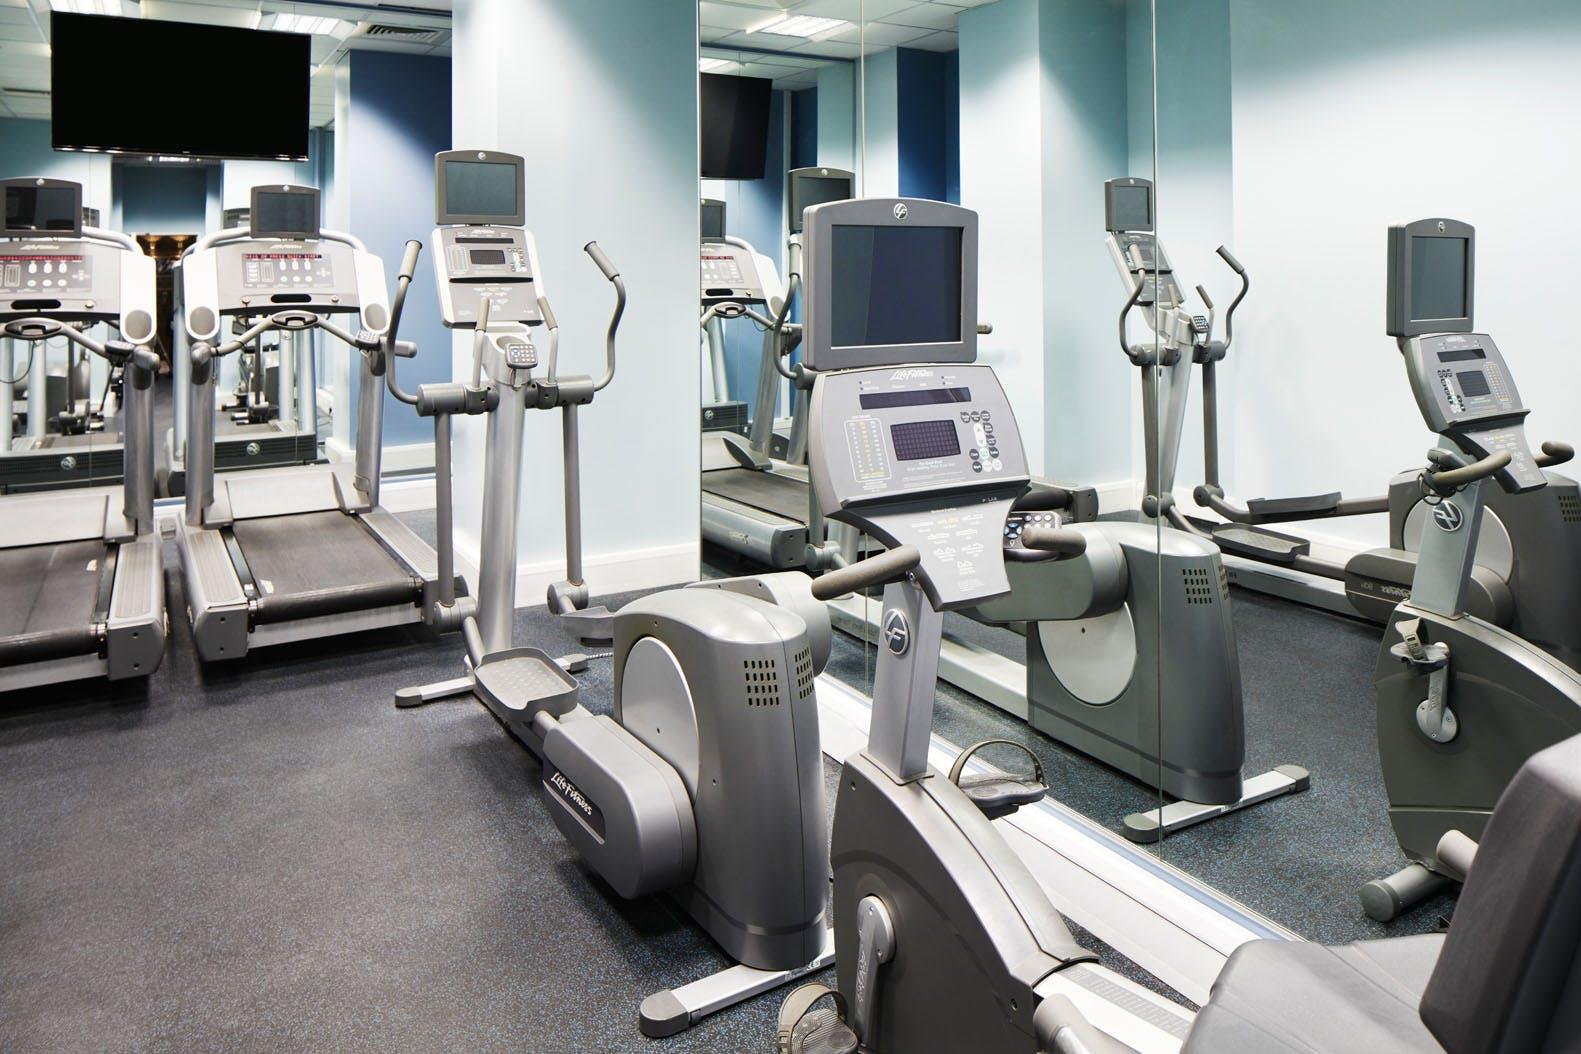 Fitness Center at Club Quarters Hotel, Trafalgar Square, London